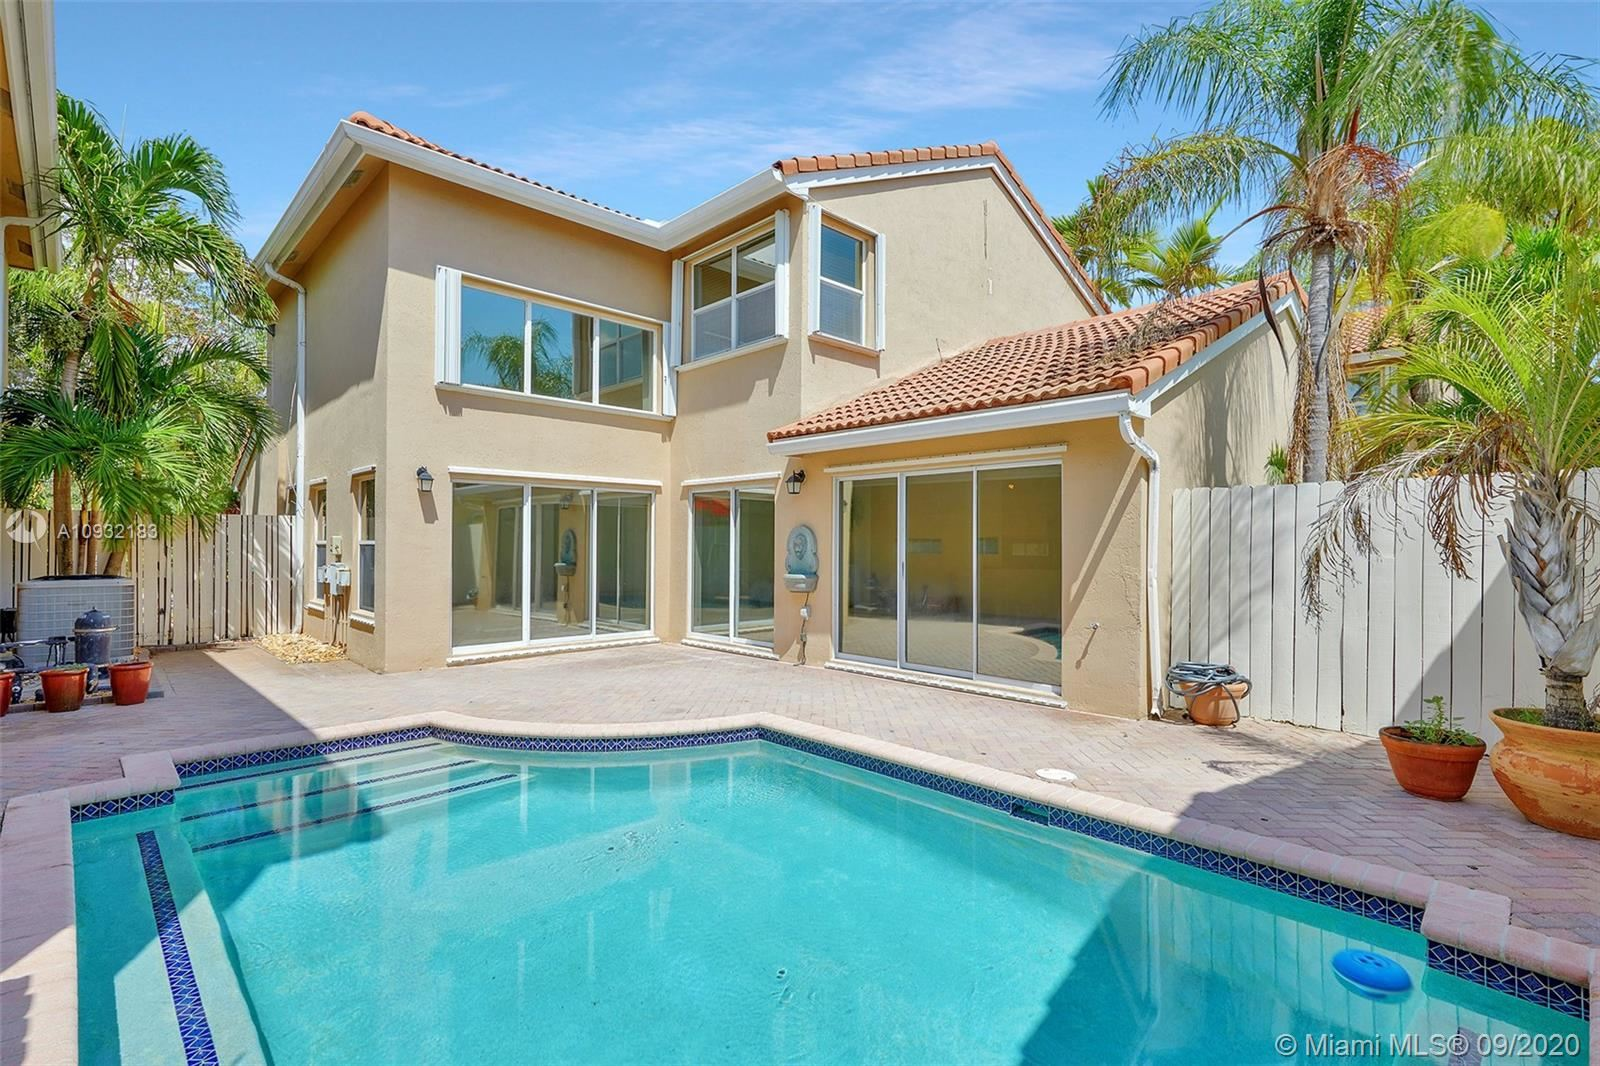 Photo of 1030 Scarlet Oak St, Hollywood, FL 33019 (MLS # A10932183)